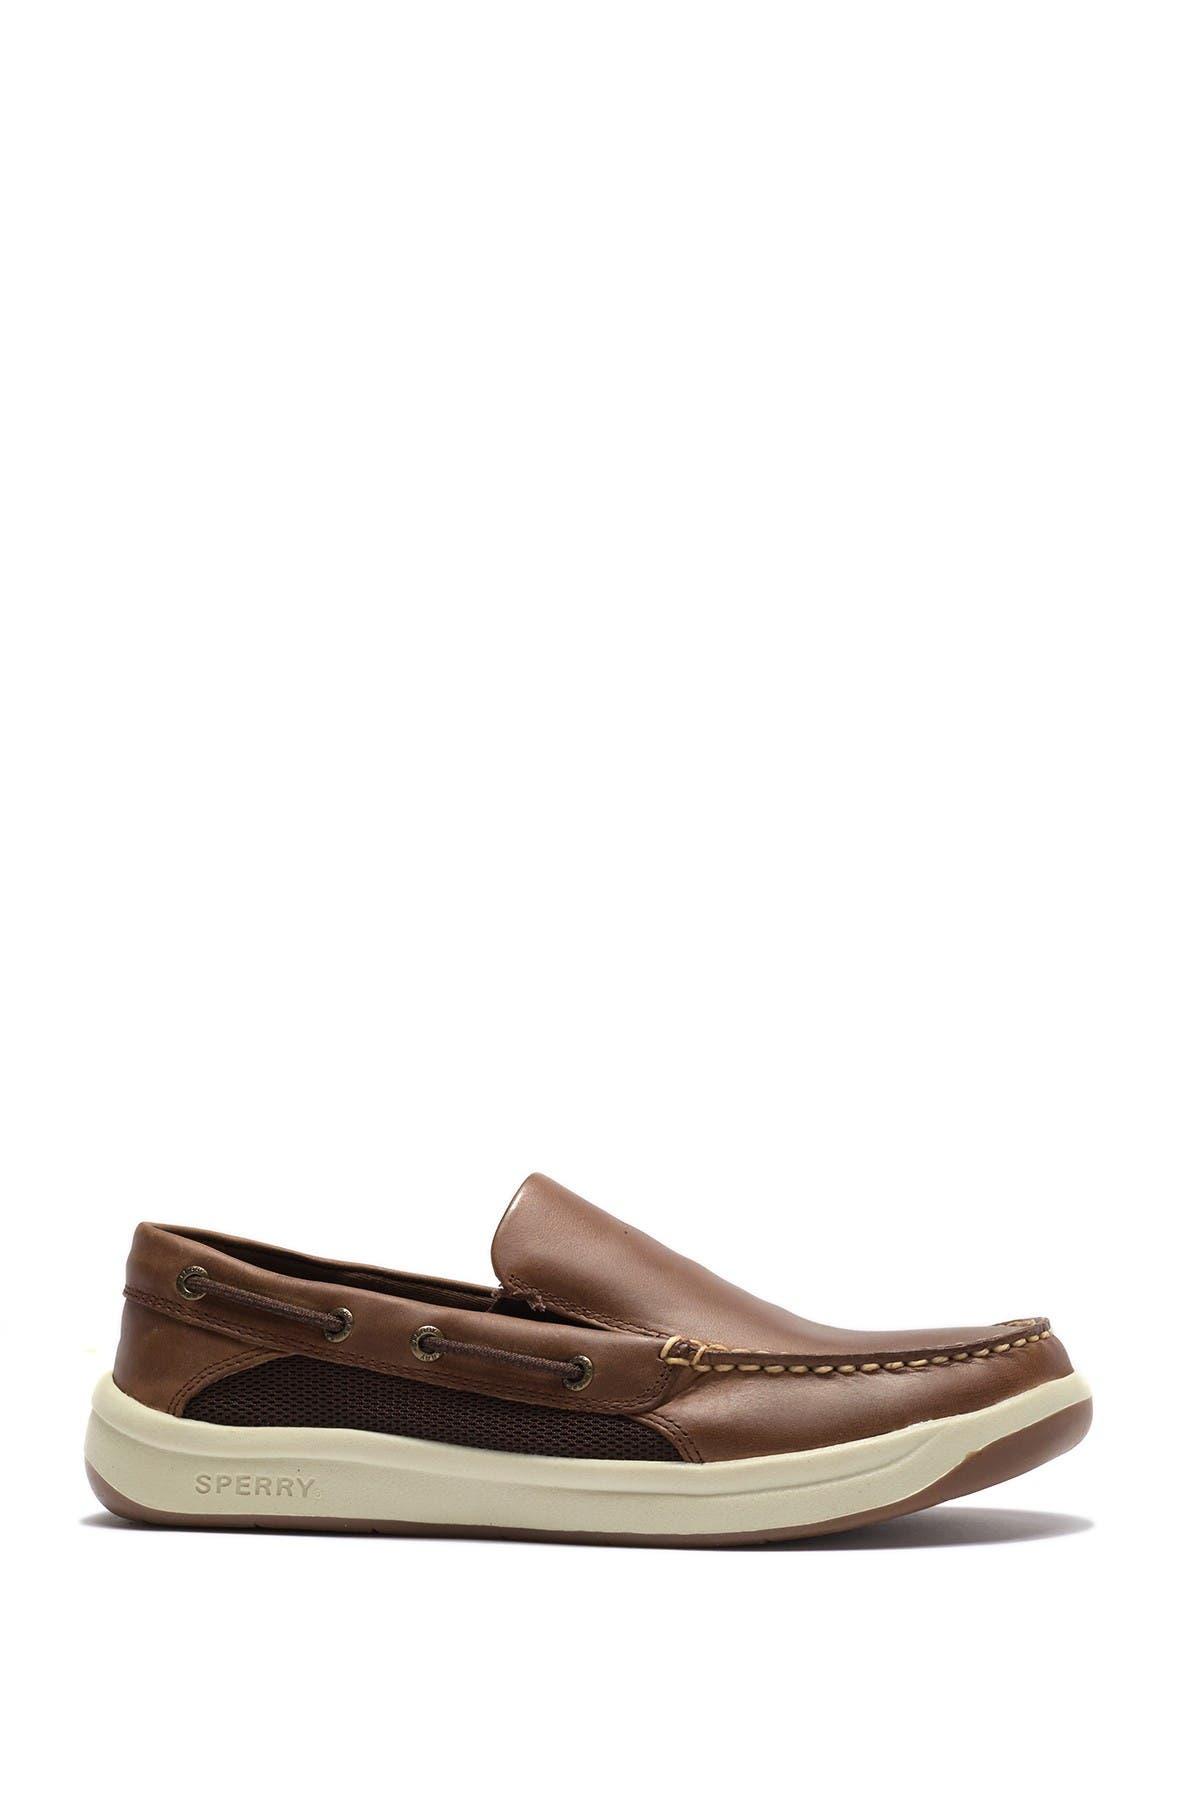 Convoy Slip-On Leather Boat Shoe